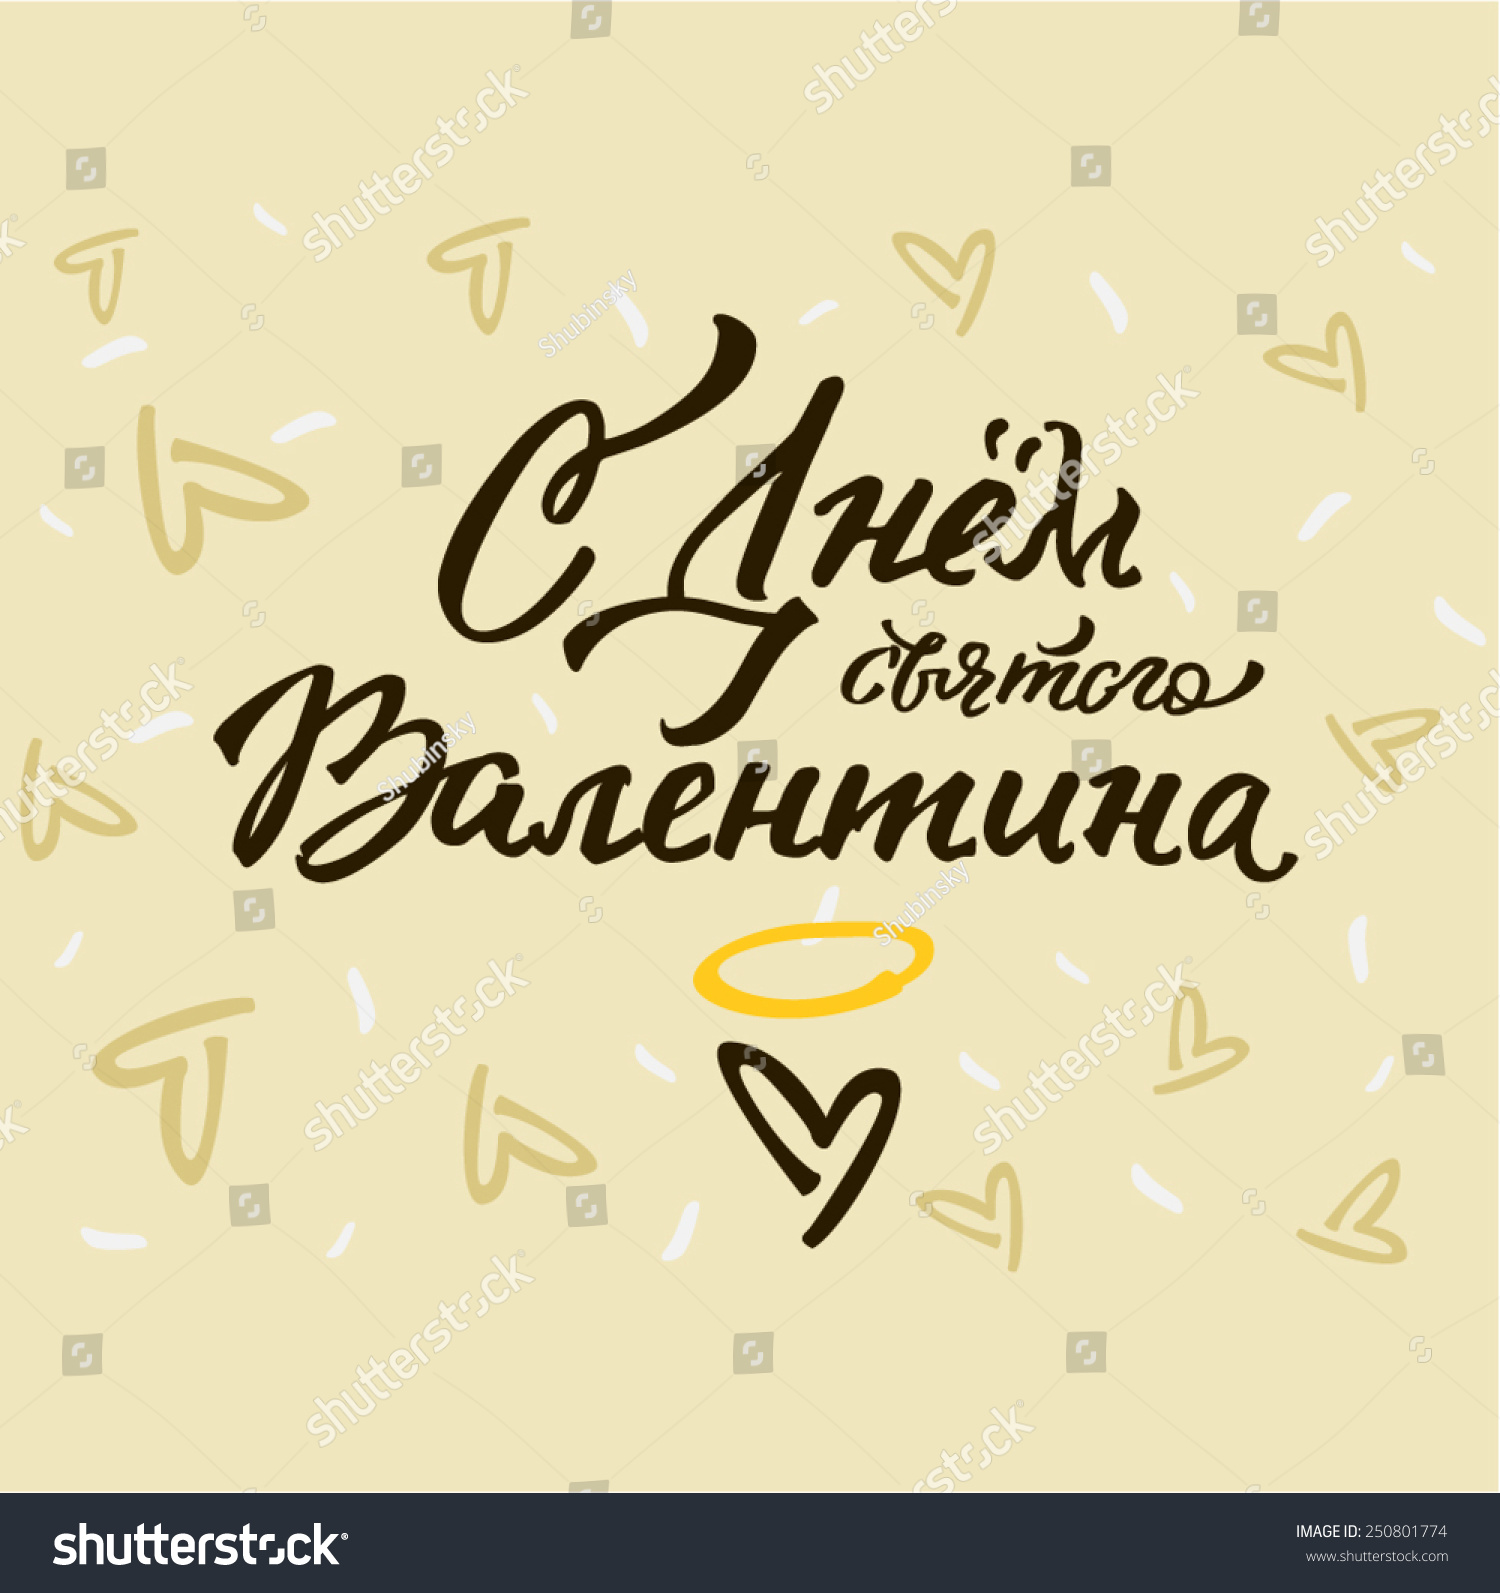 Greetings russian language text happy valentines stock vector greetings in russian language text happy valentines day inscription letter lettering beautiful vintage handmade ink letter kristyandbryce Gallery